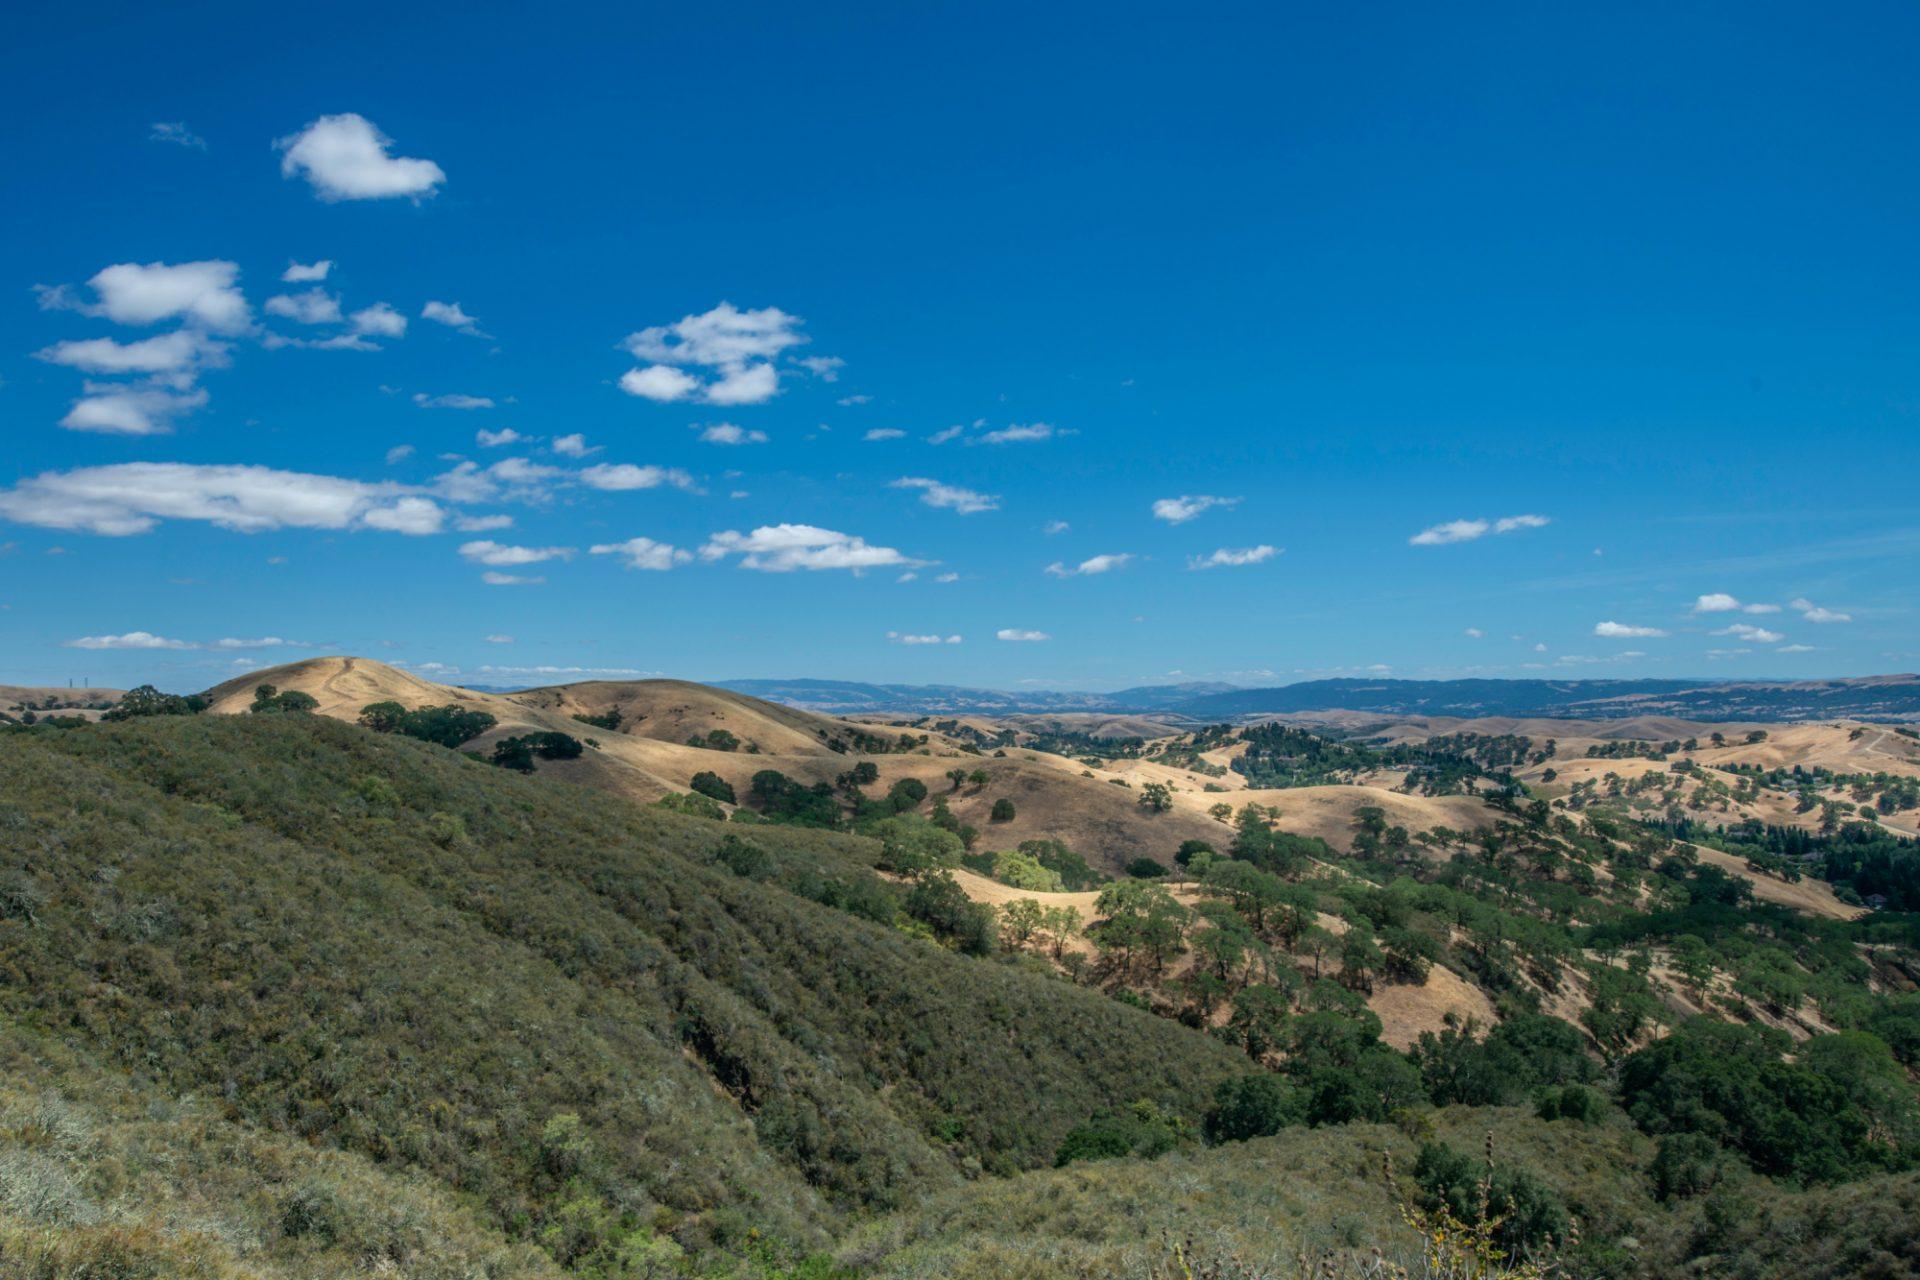 View from Mt Diablo, California.